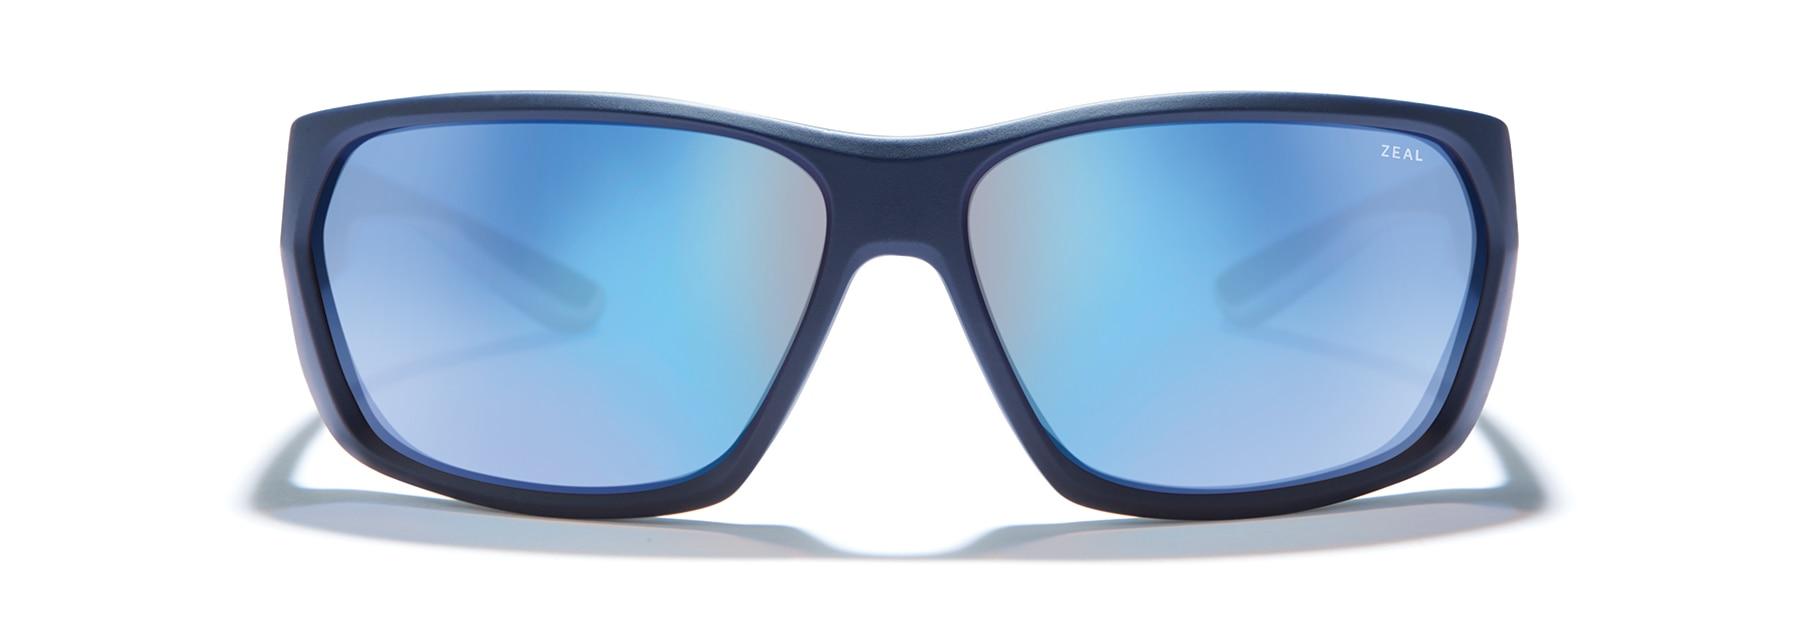 7256c3b5425 Shop CADDIS (Z1439) Sunglasses by Zeal